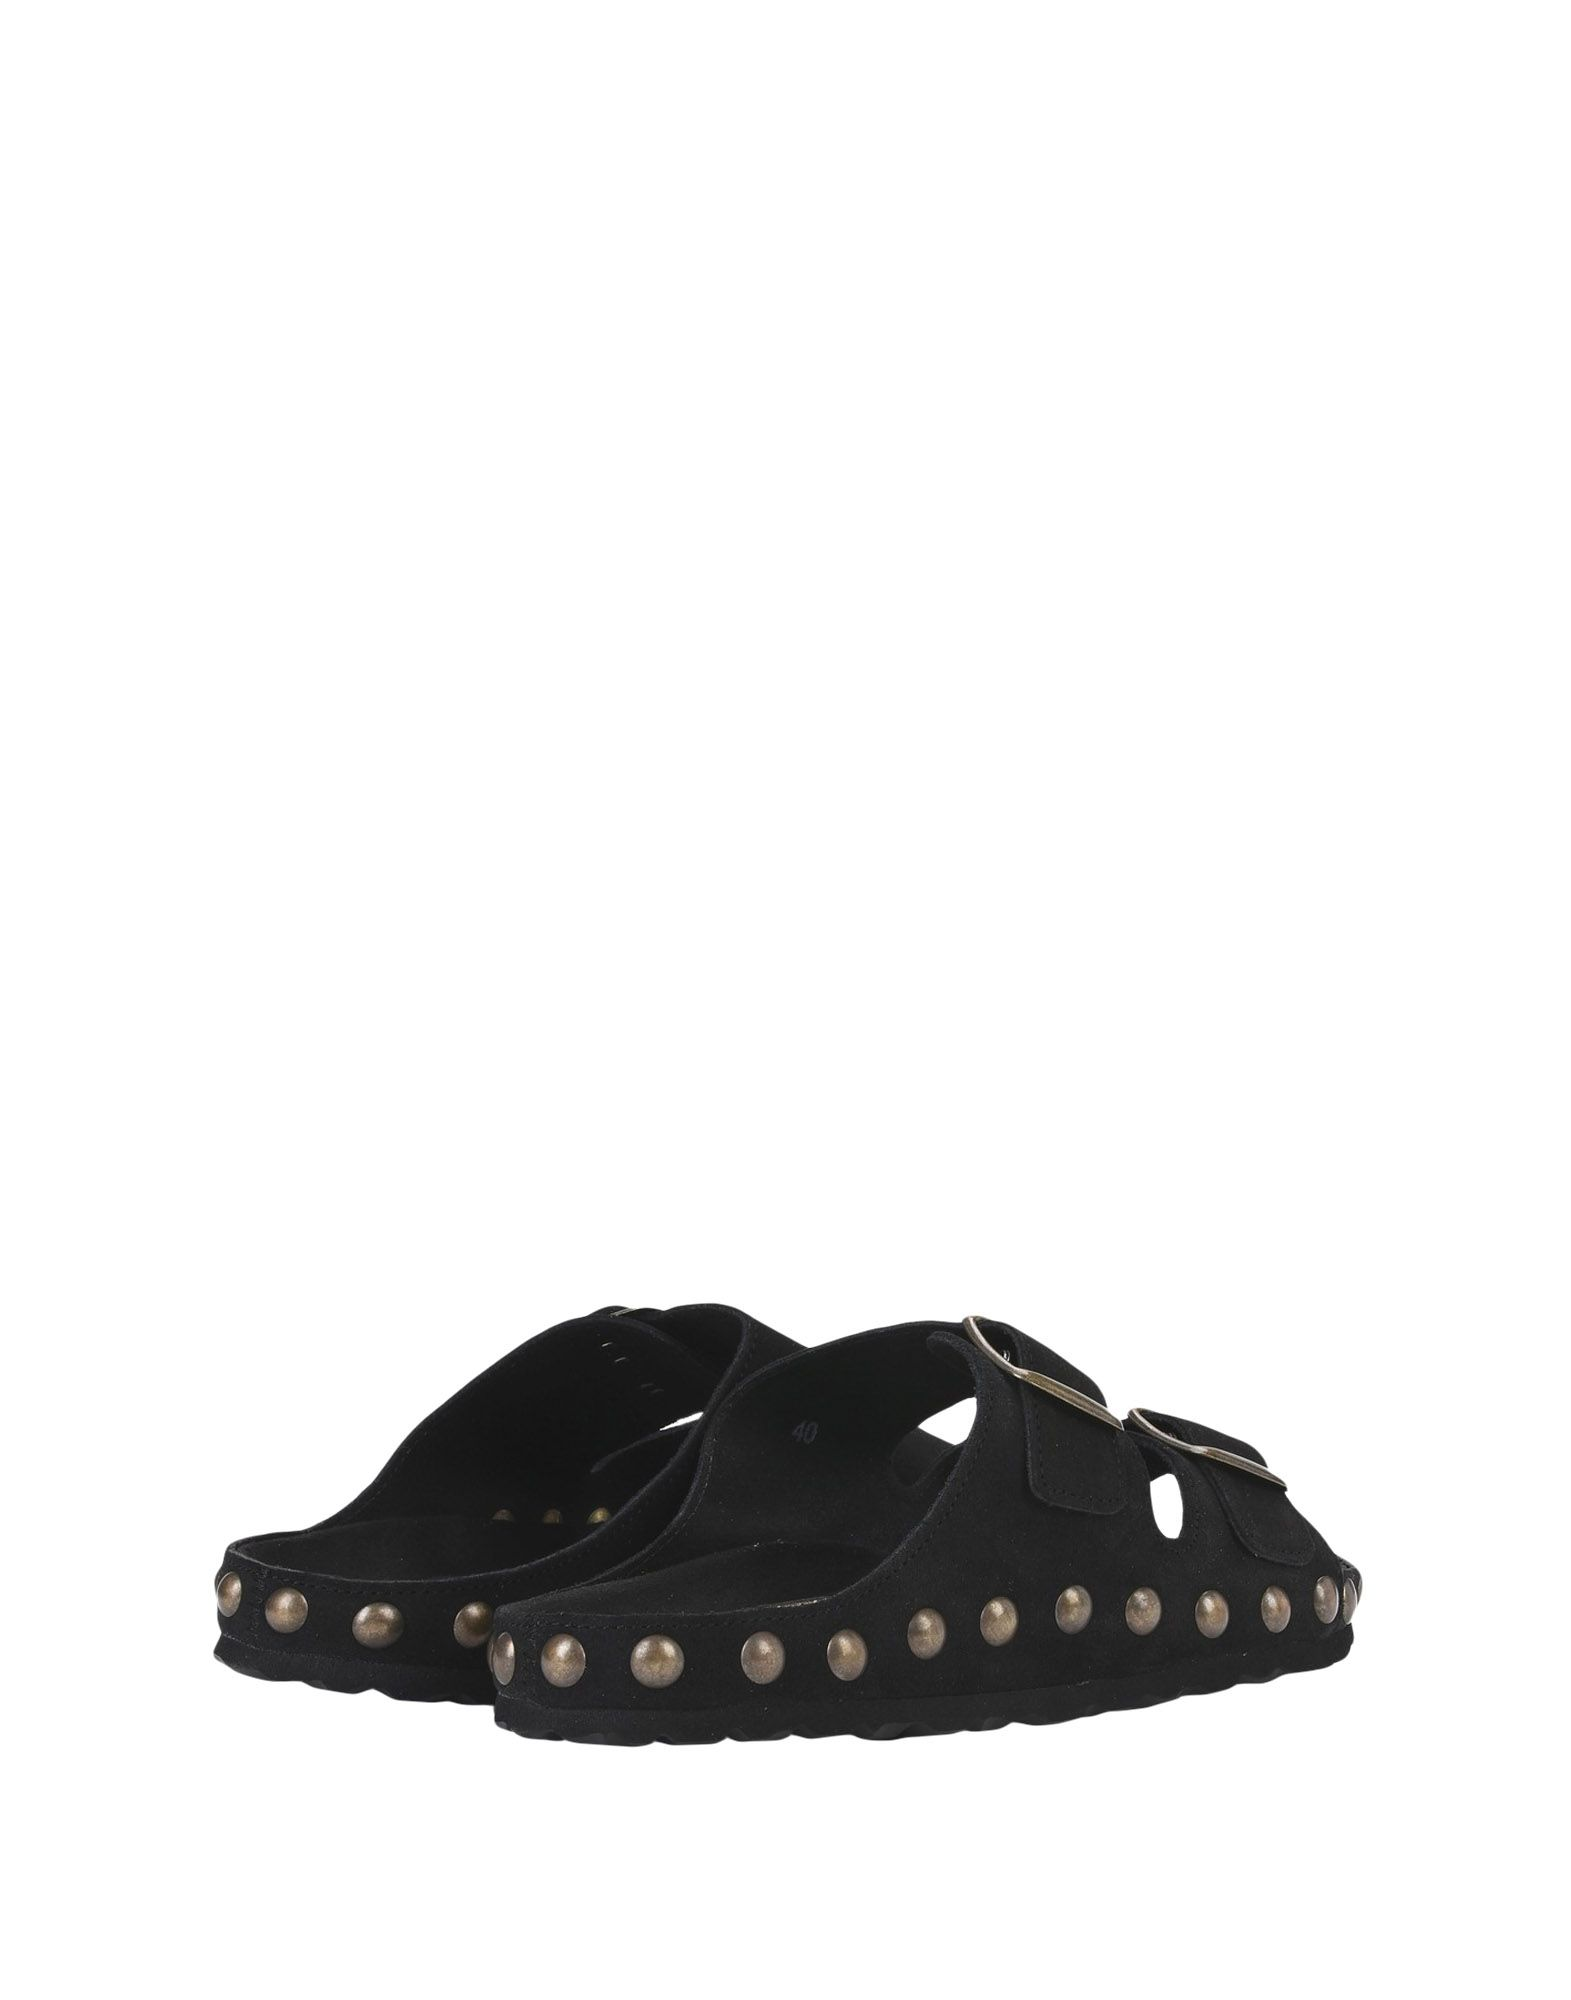 Maison Shoeshibar Akiko  11476788UE Gute Qualität beliebte Schuhe